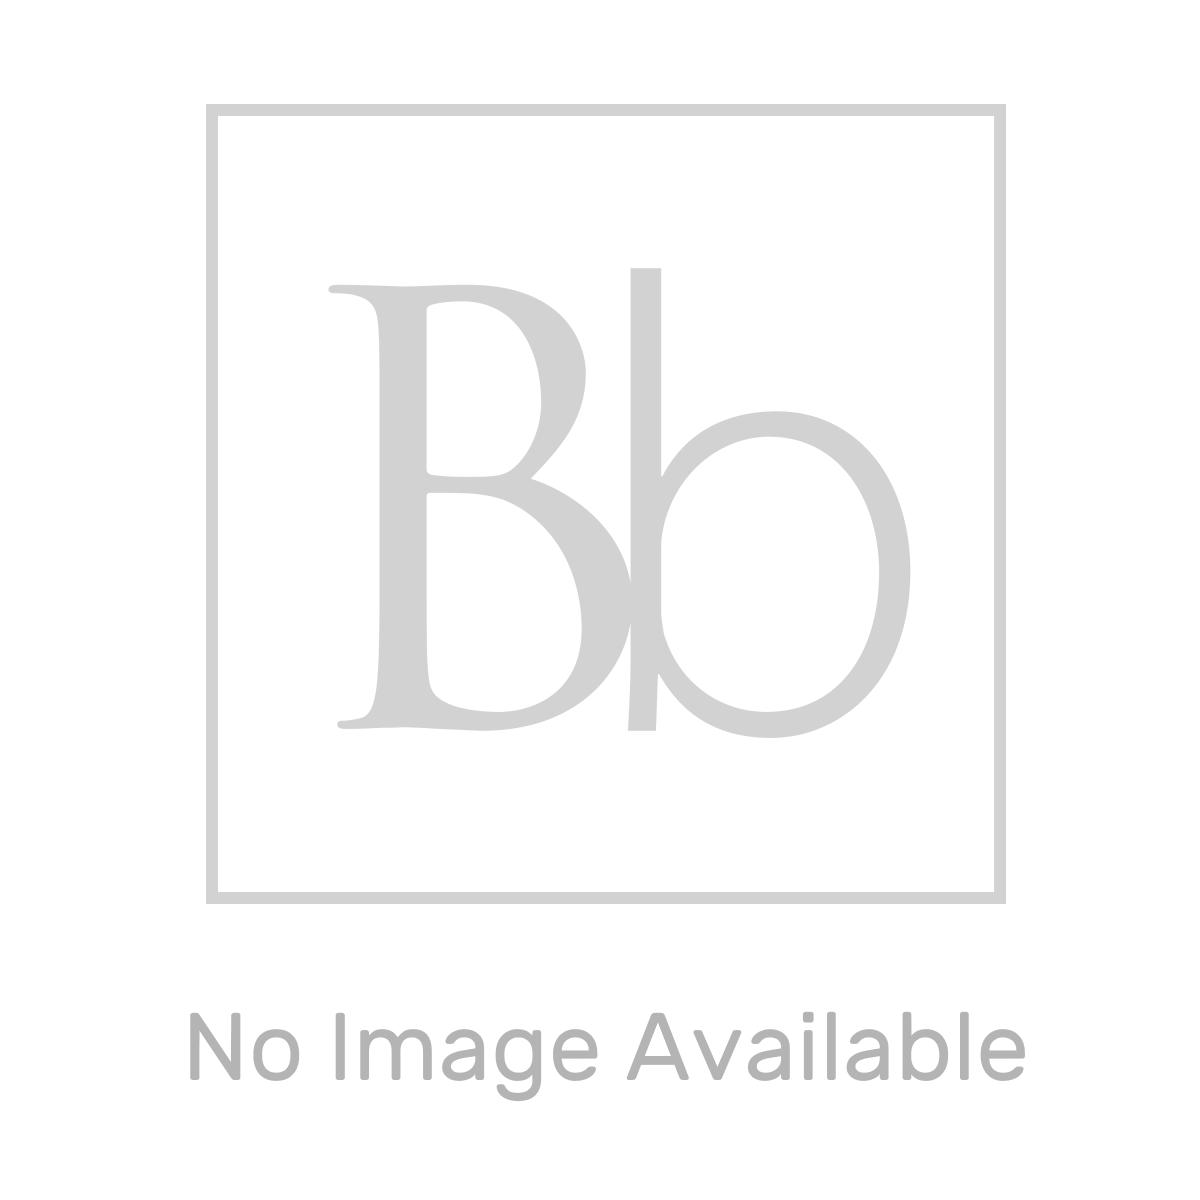 RAK Compact Shower Suite with Pacific Pivot Door Shower Enclosure